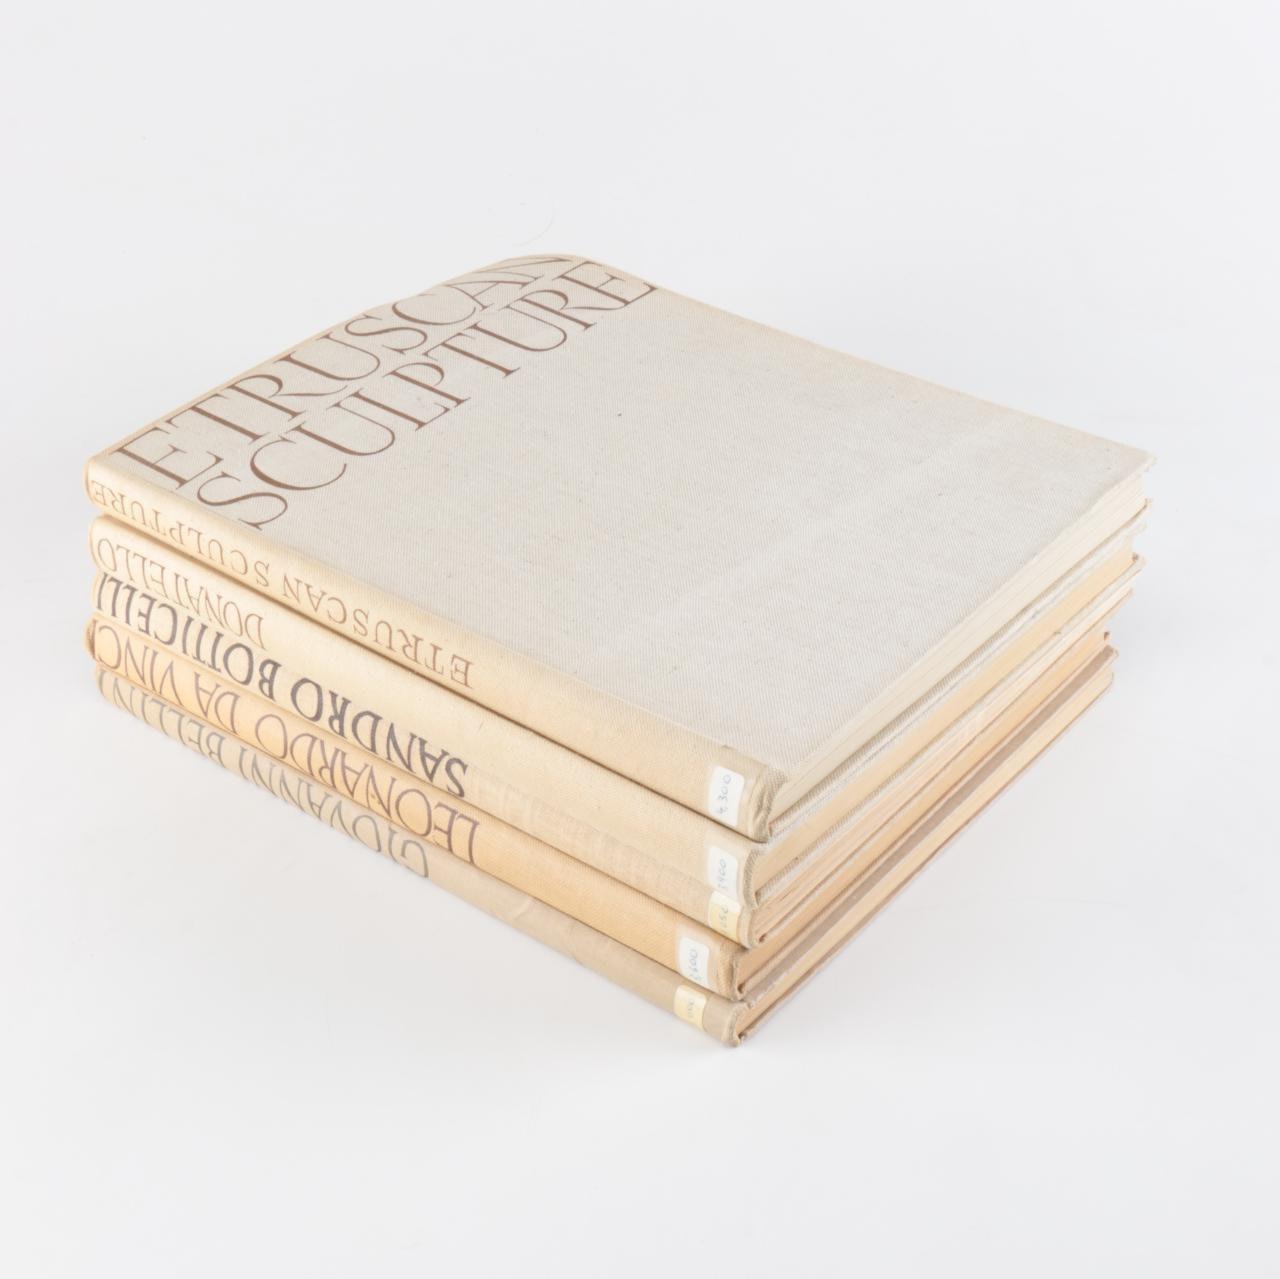 Phaidon Edition Folio Books on Etruscan and Italian Art